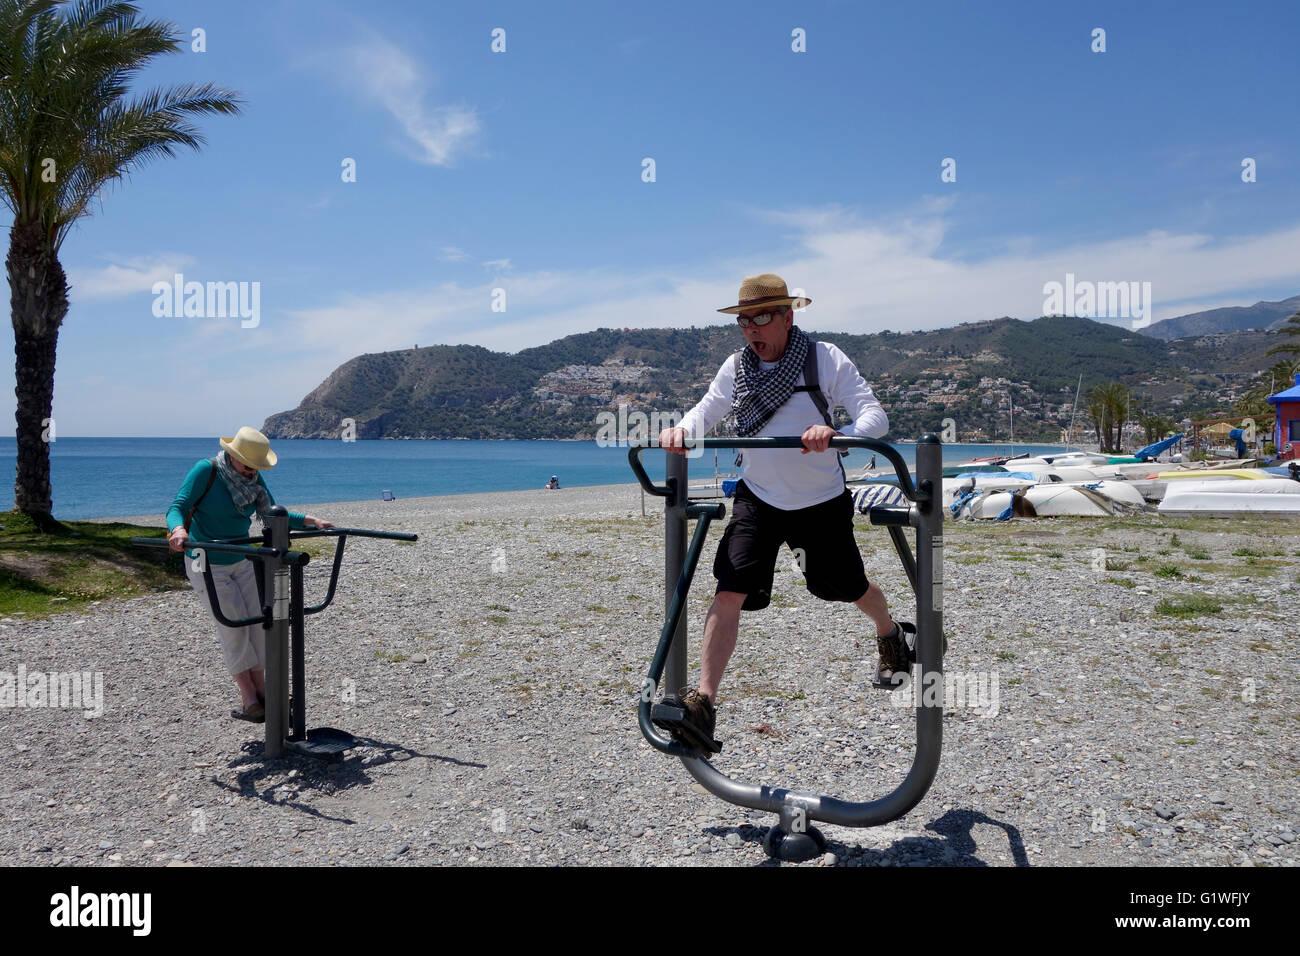 People using public keep fit exercise machines on Herradura beach in Spain Europe - Stock Image